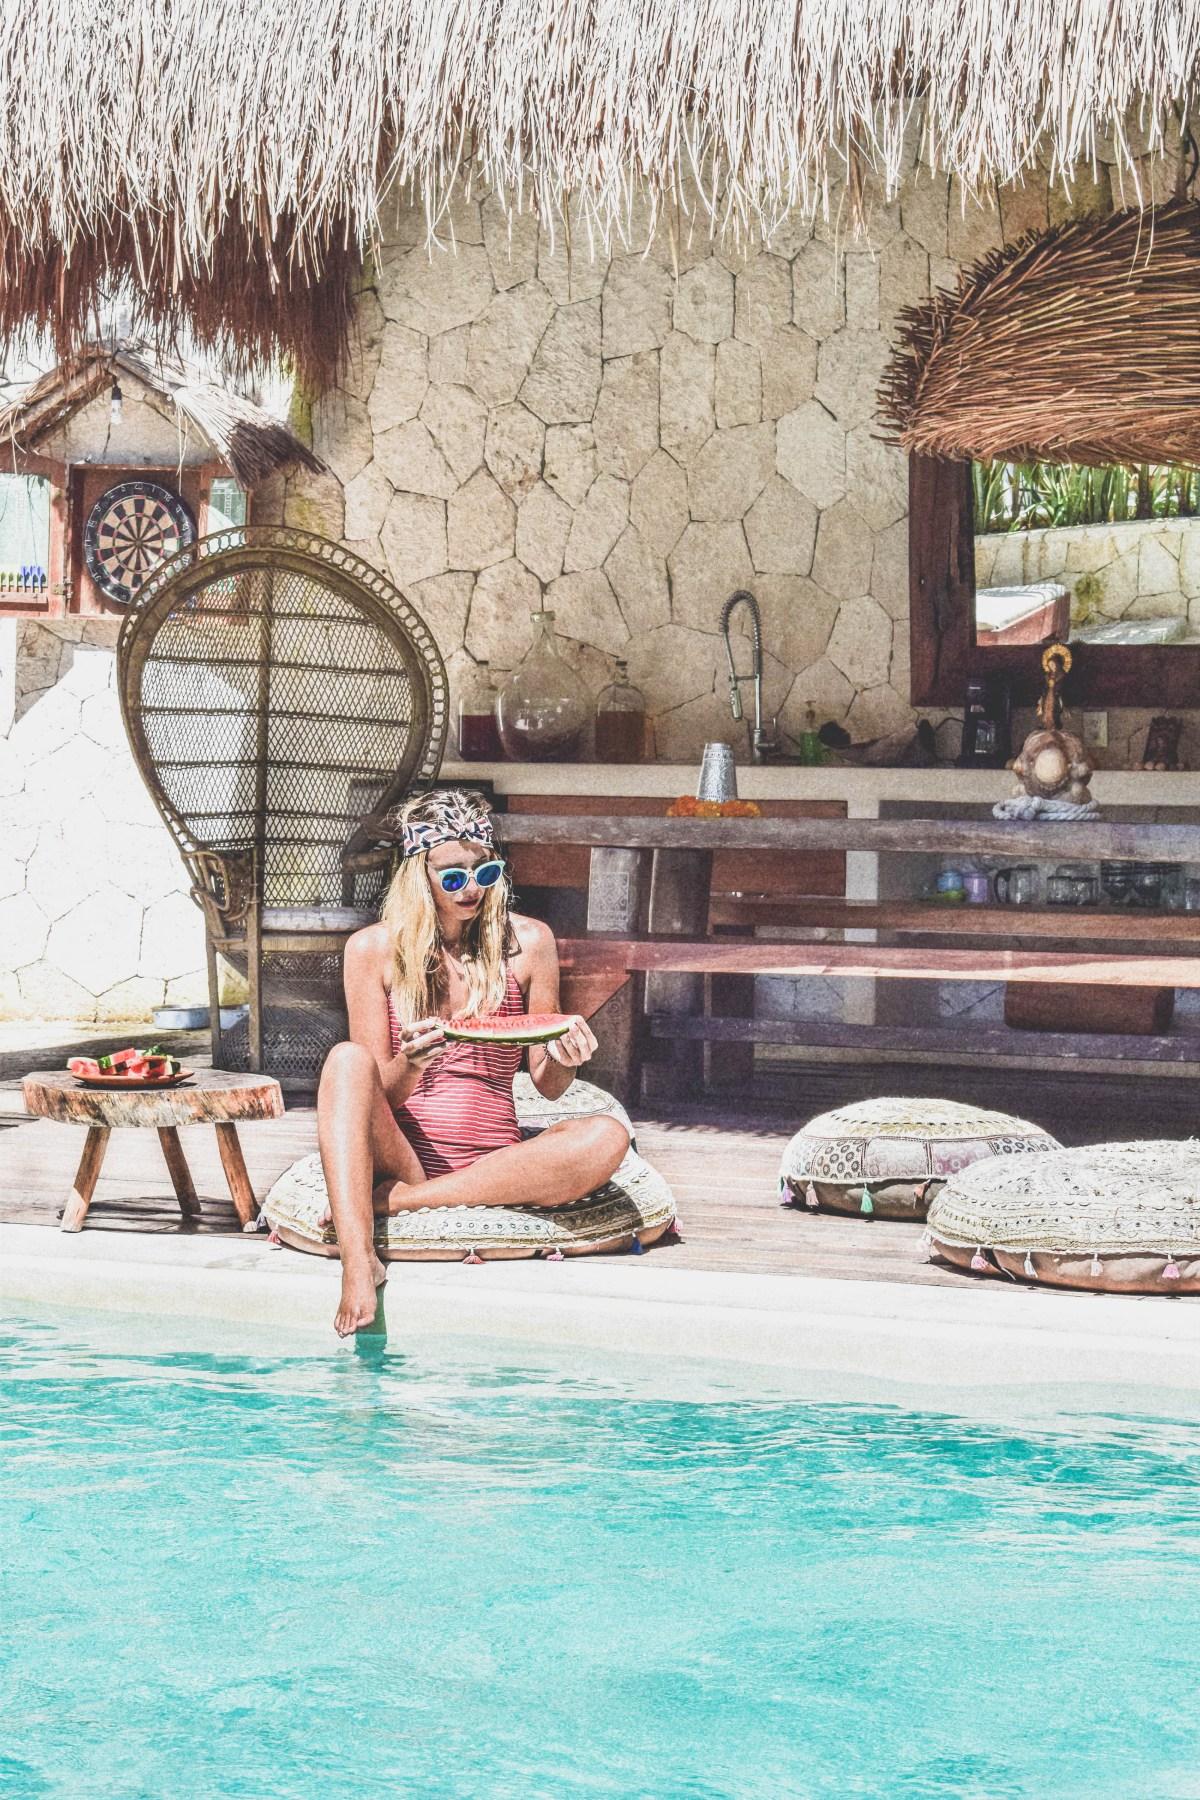 9 Reasons Why You Should Stay at Una Vida Tulum, Mexico